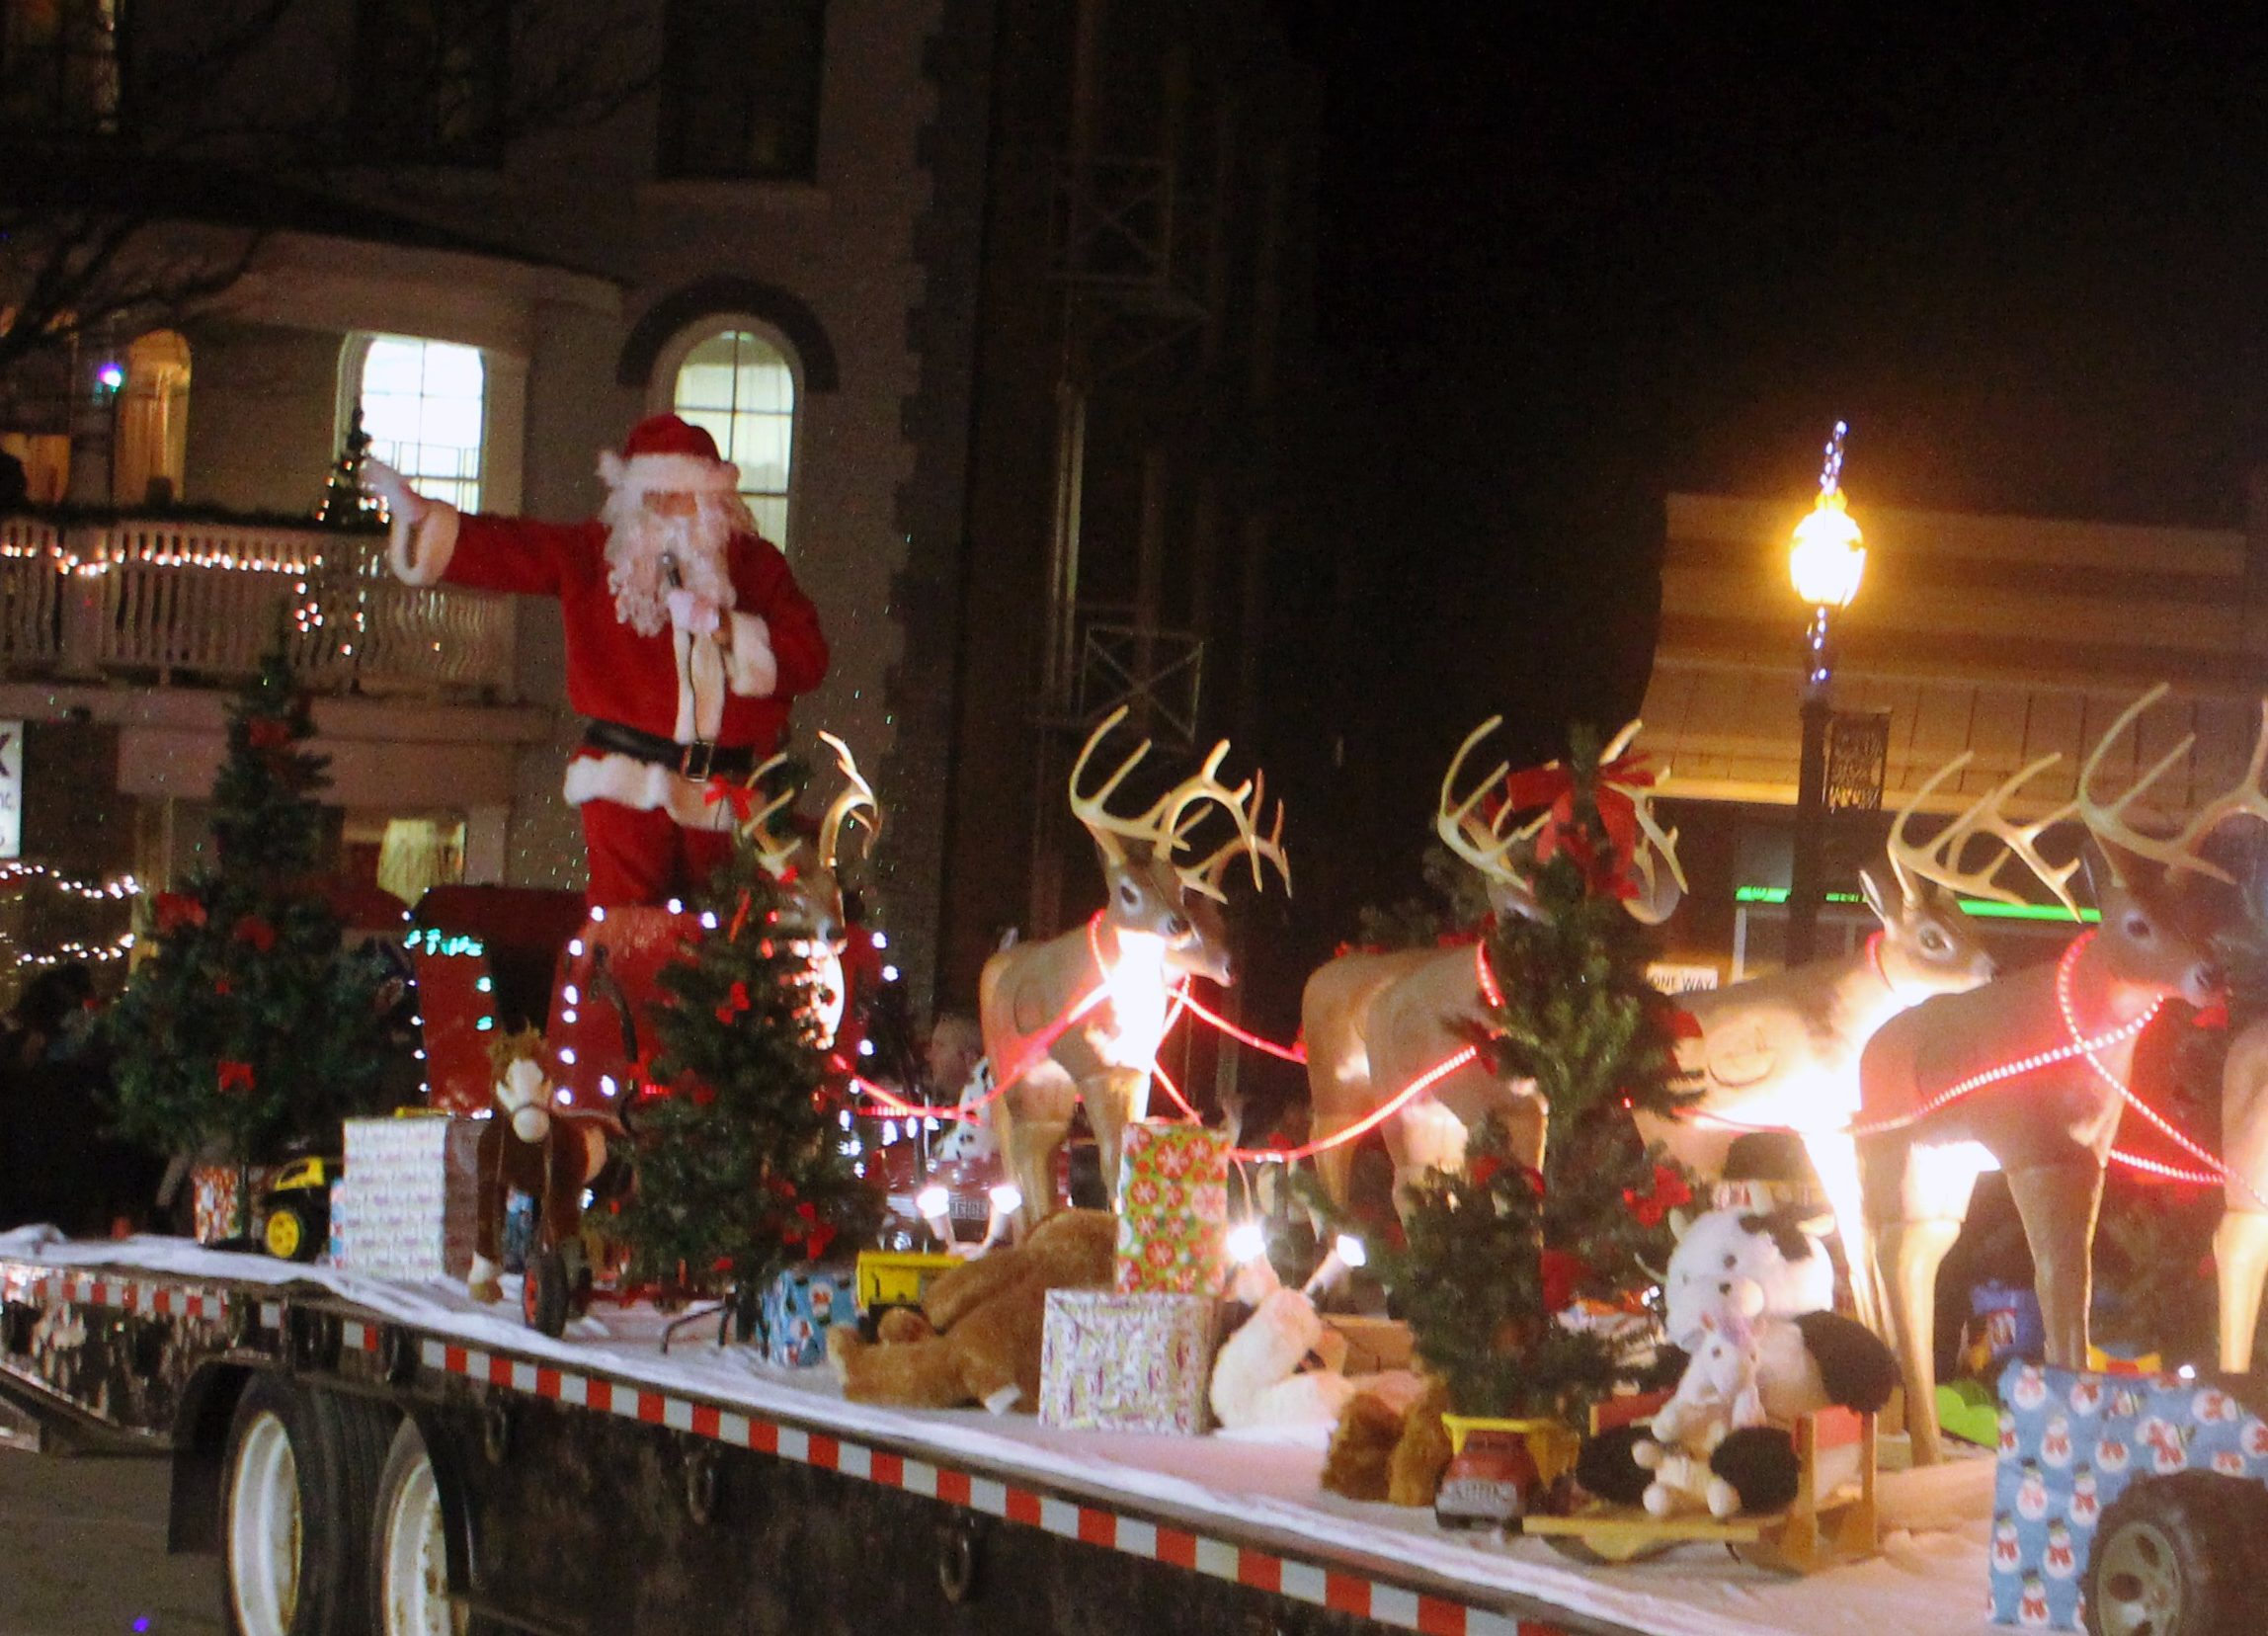 Santa Claus parade set to light up streets of Beaverton tonight